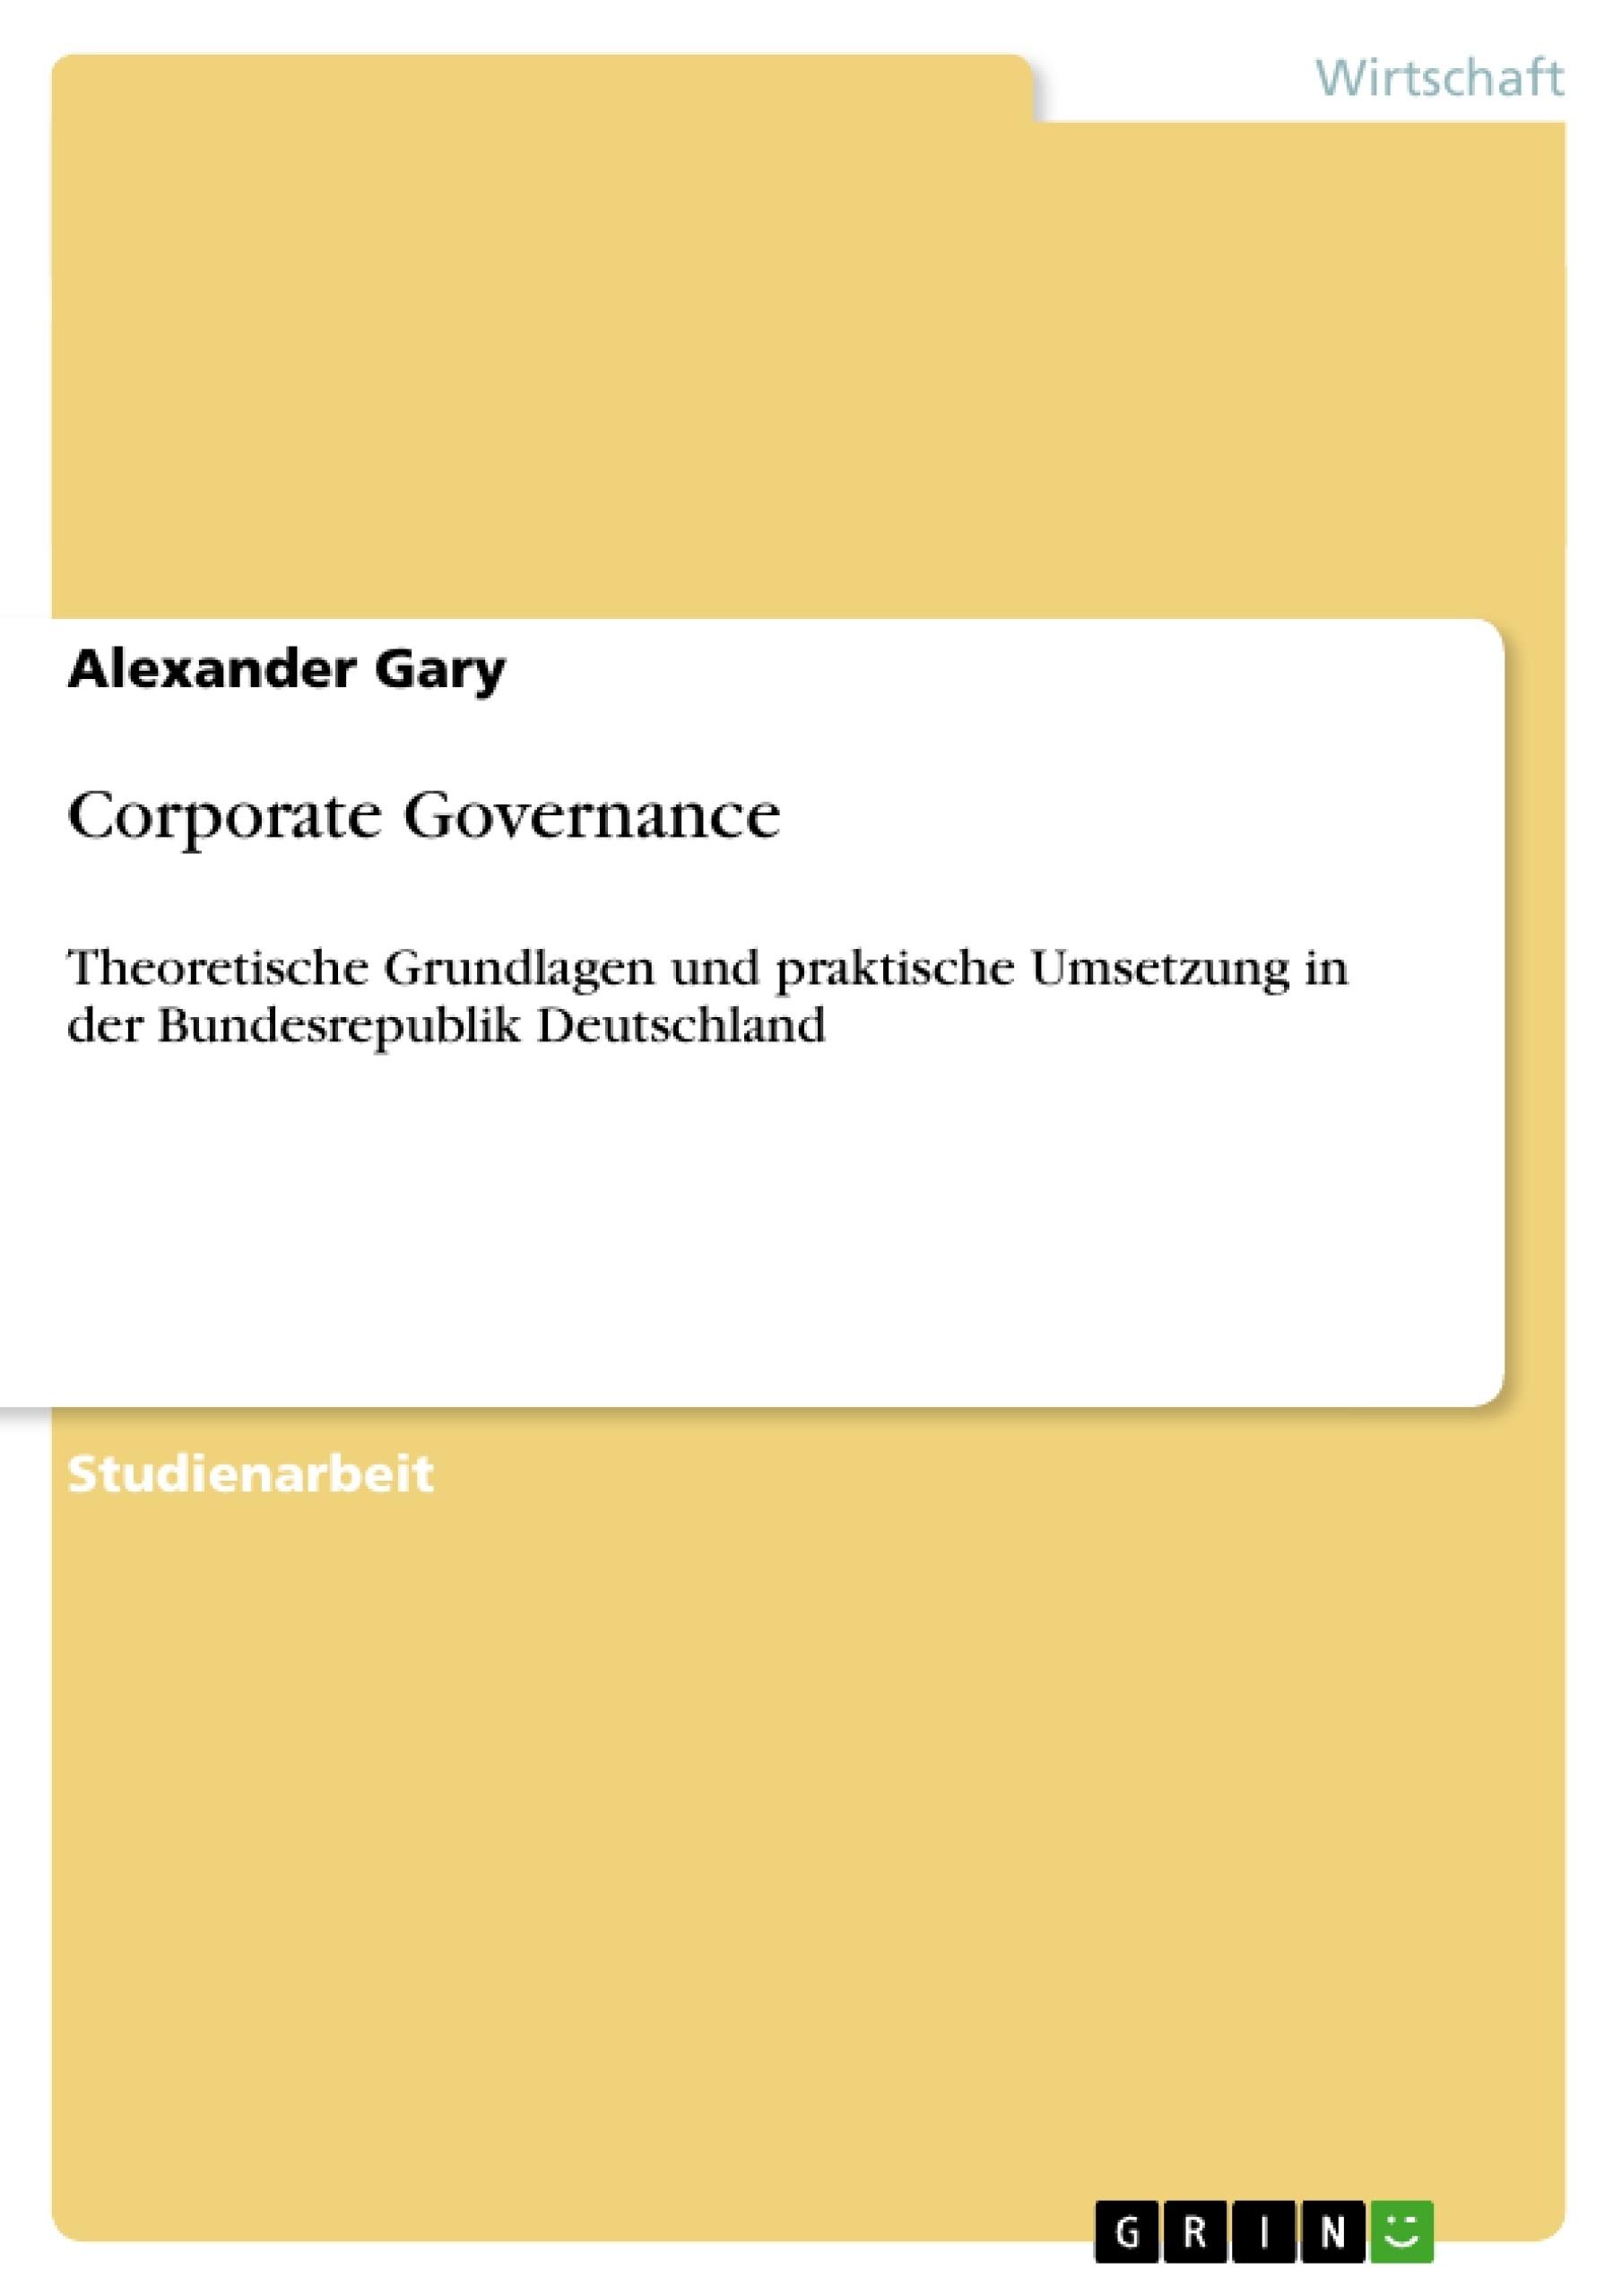 Titel: Corporate Governance